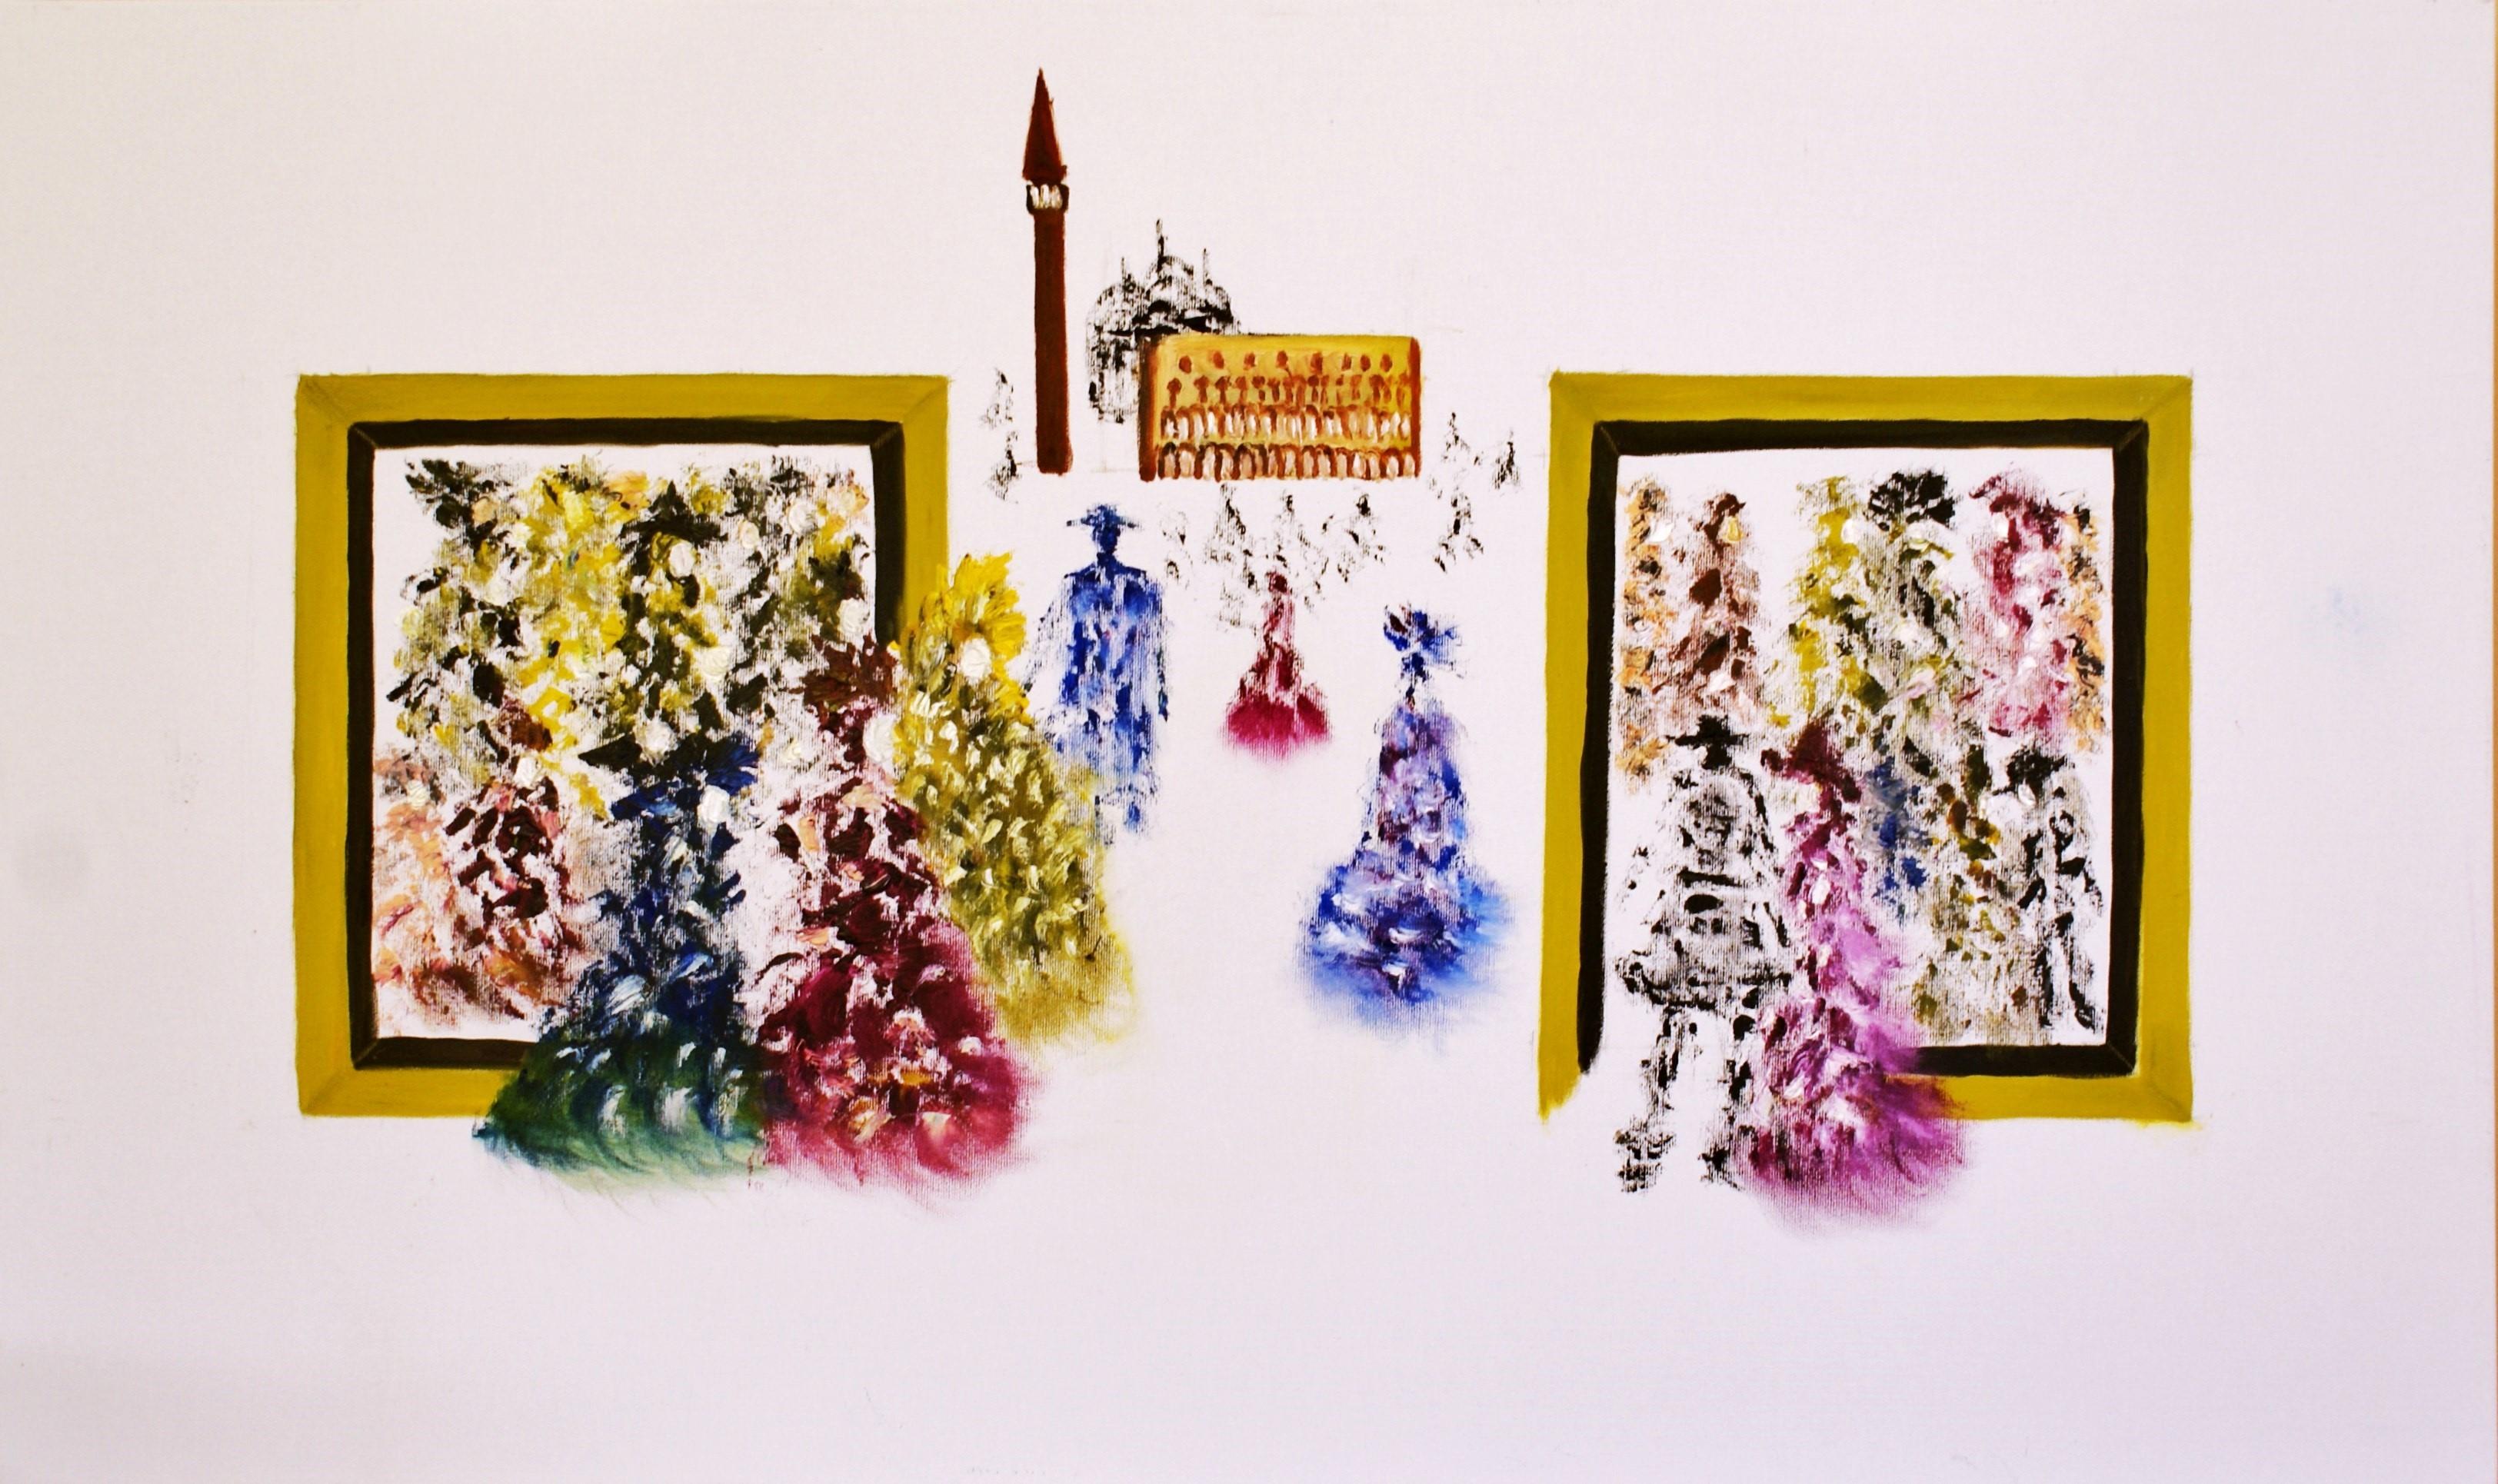 Tutti vanno al Carnevale II. artwork by LETIZIA ZOMBORY - art listed for sale on Artplode